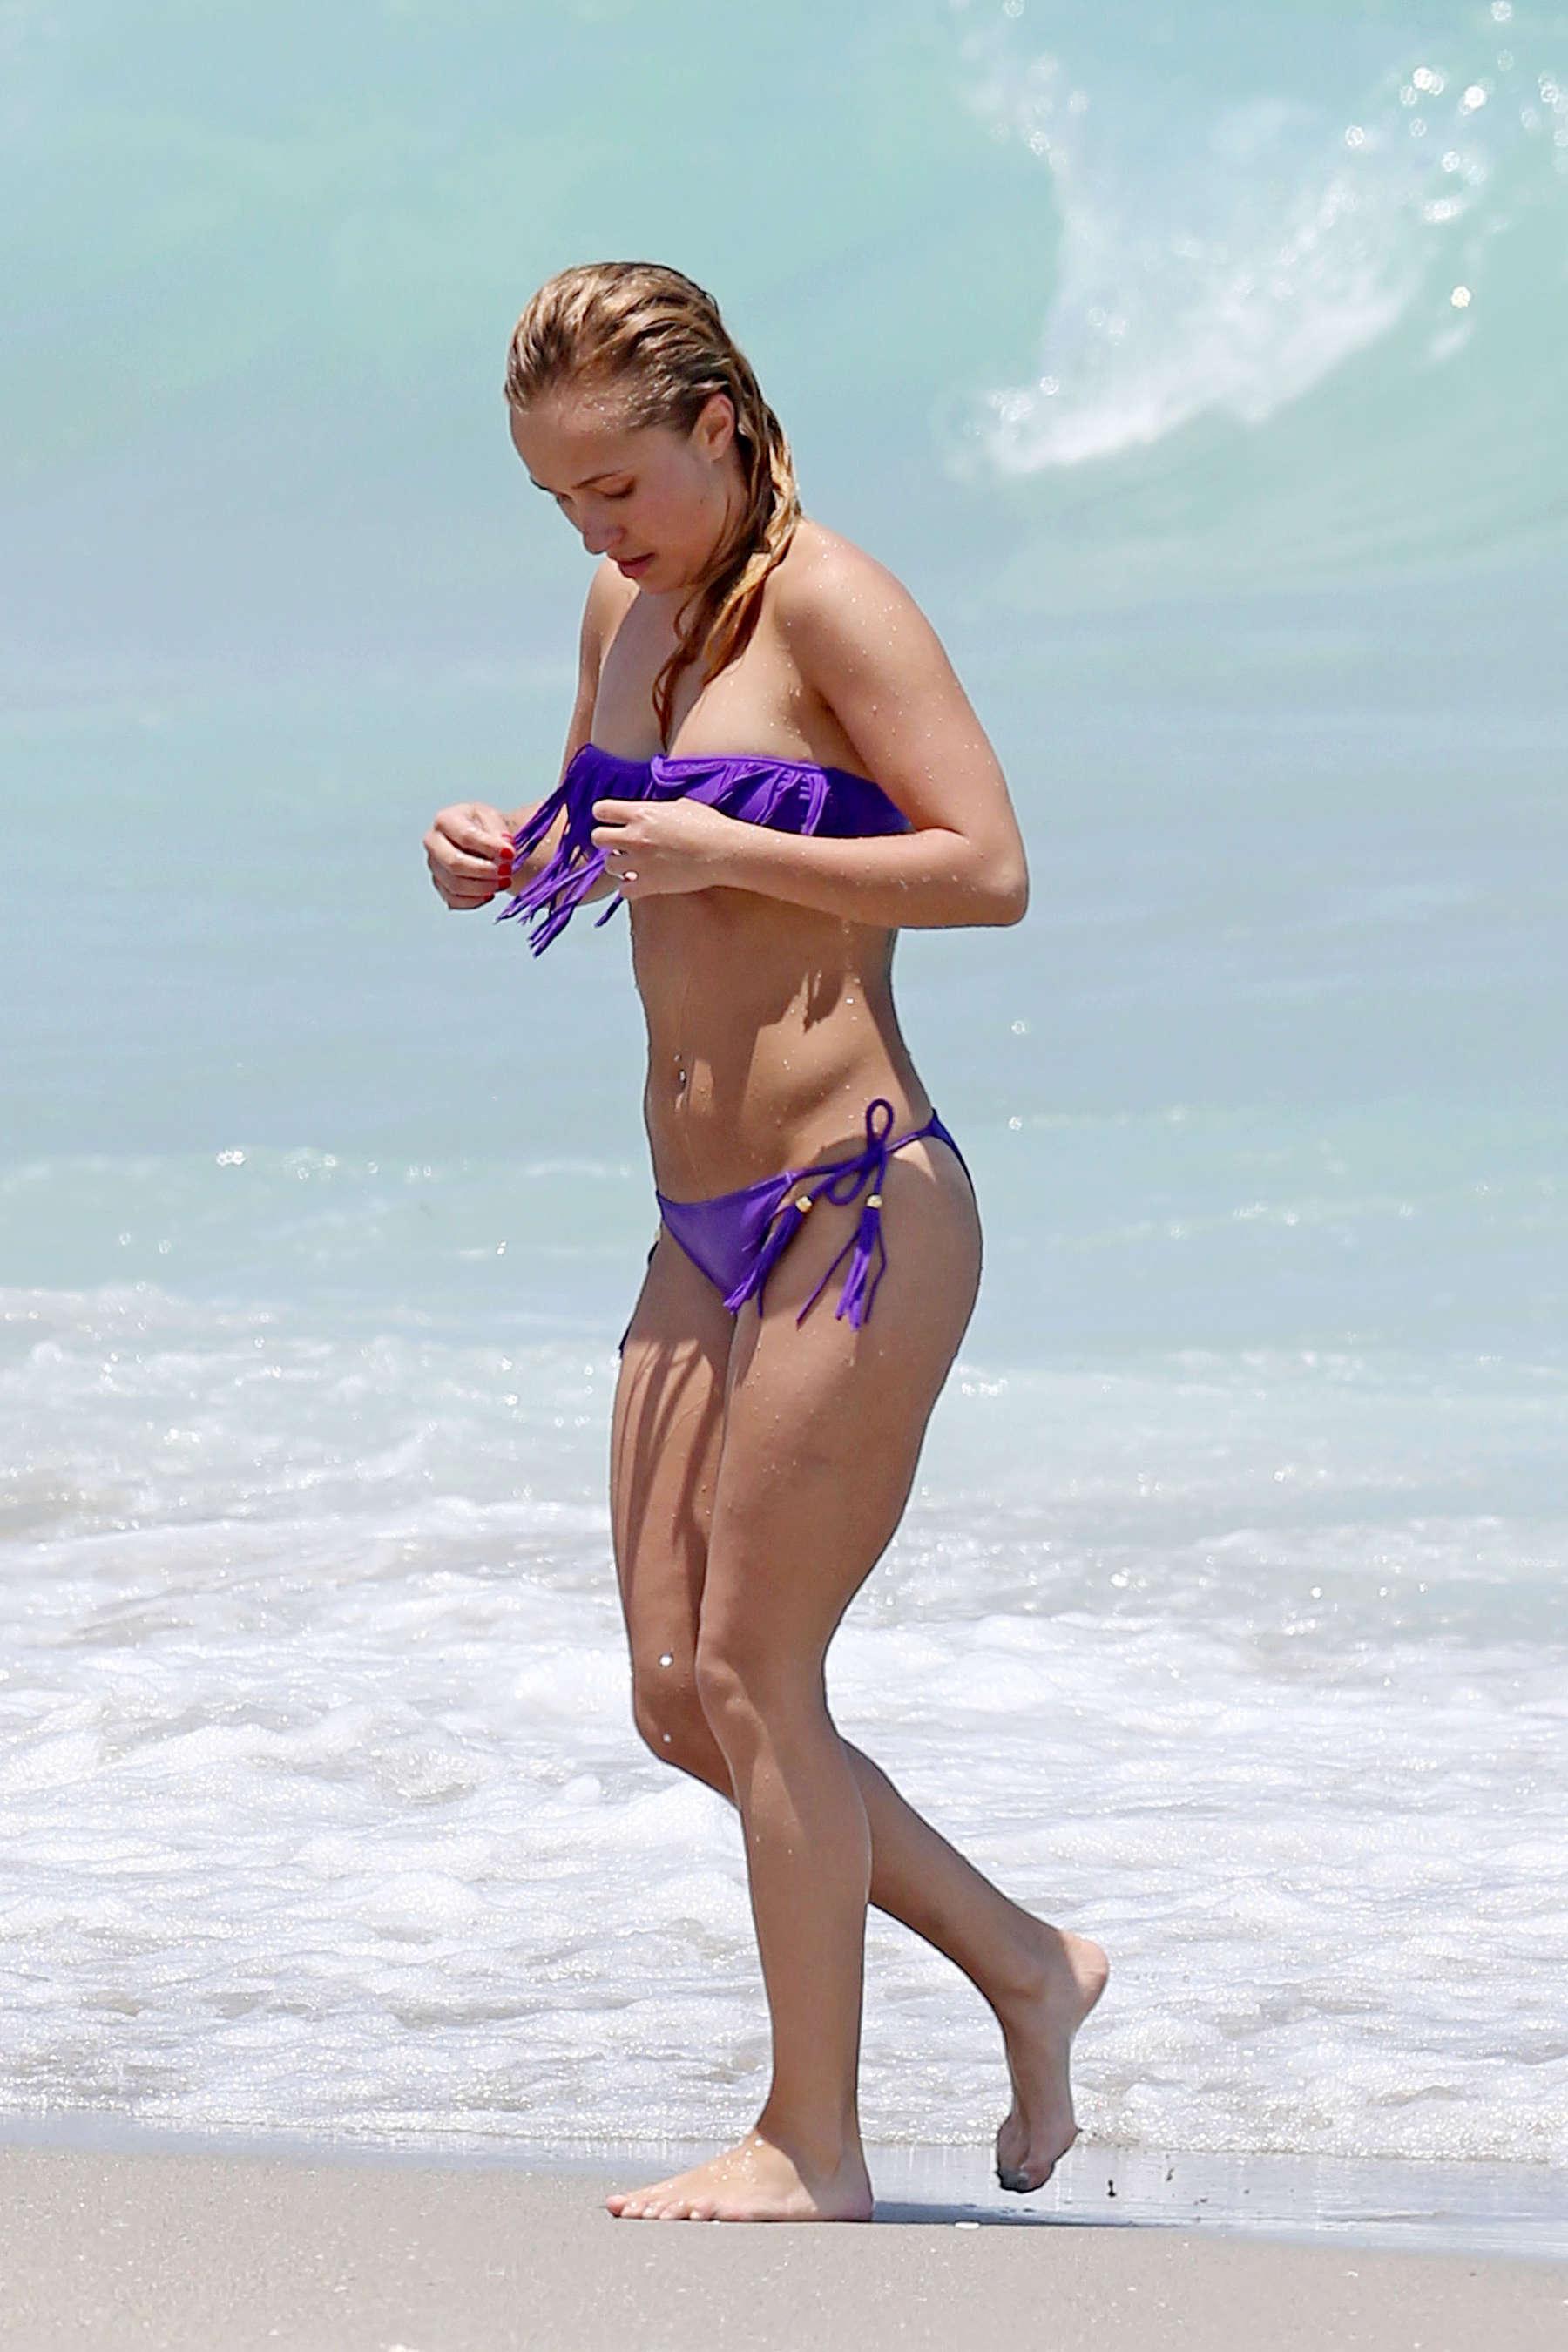 Hayden penettiere bikini